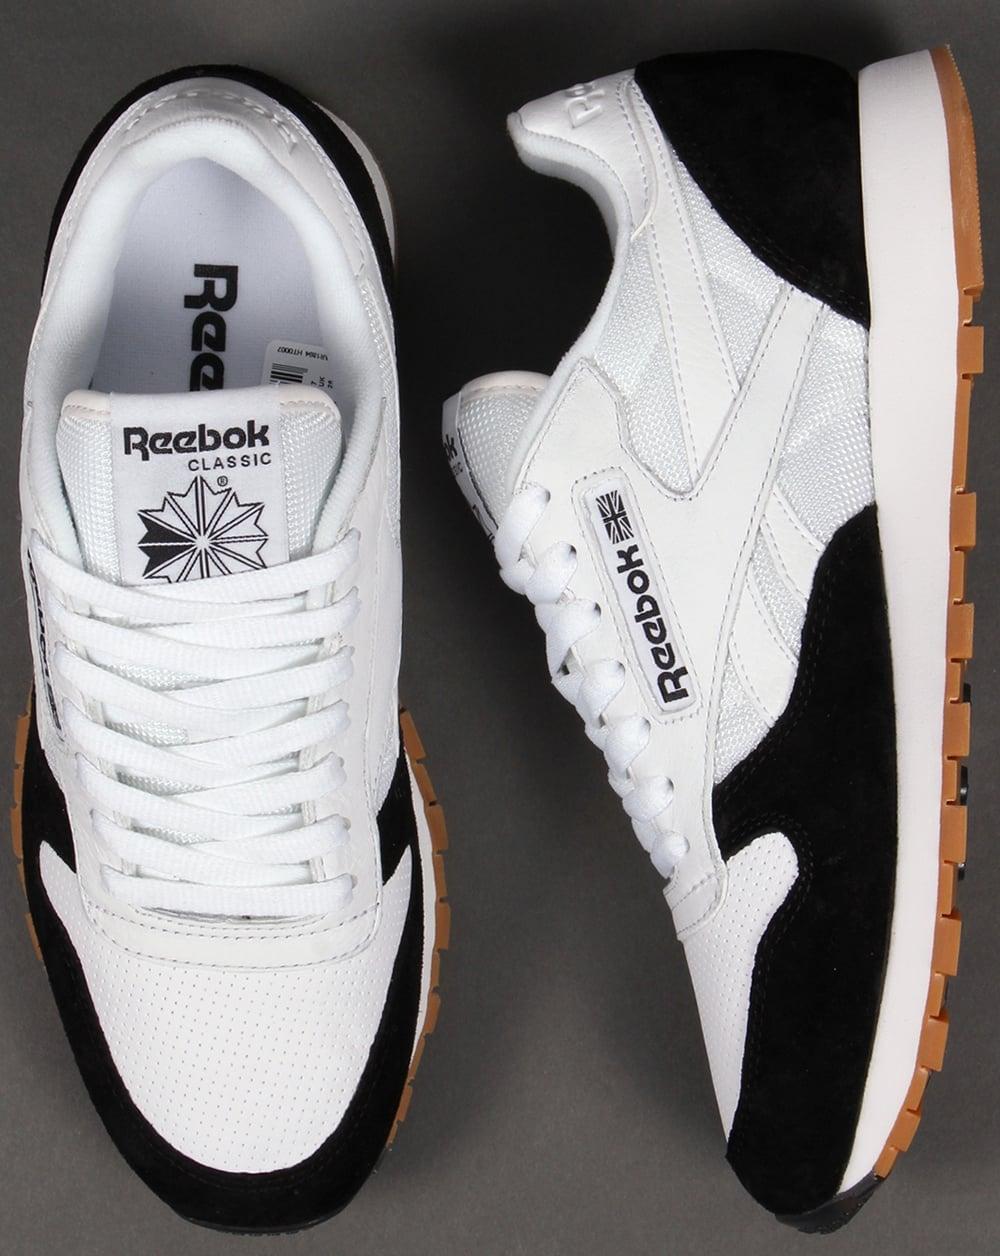 8d350f068296 Reebok Classic Leather Perfect Split Trainers White Black